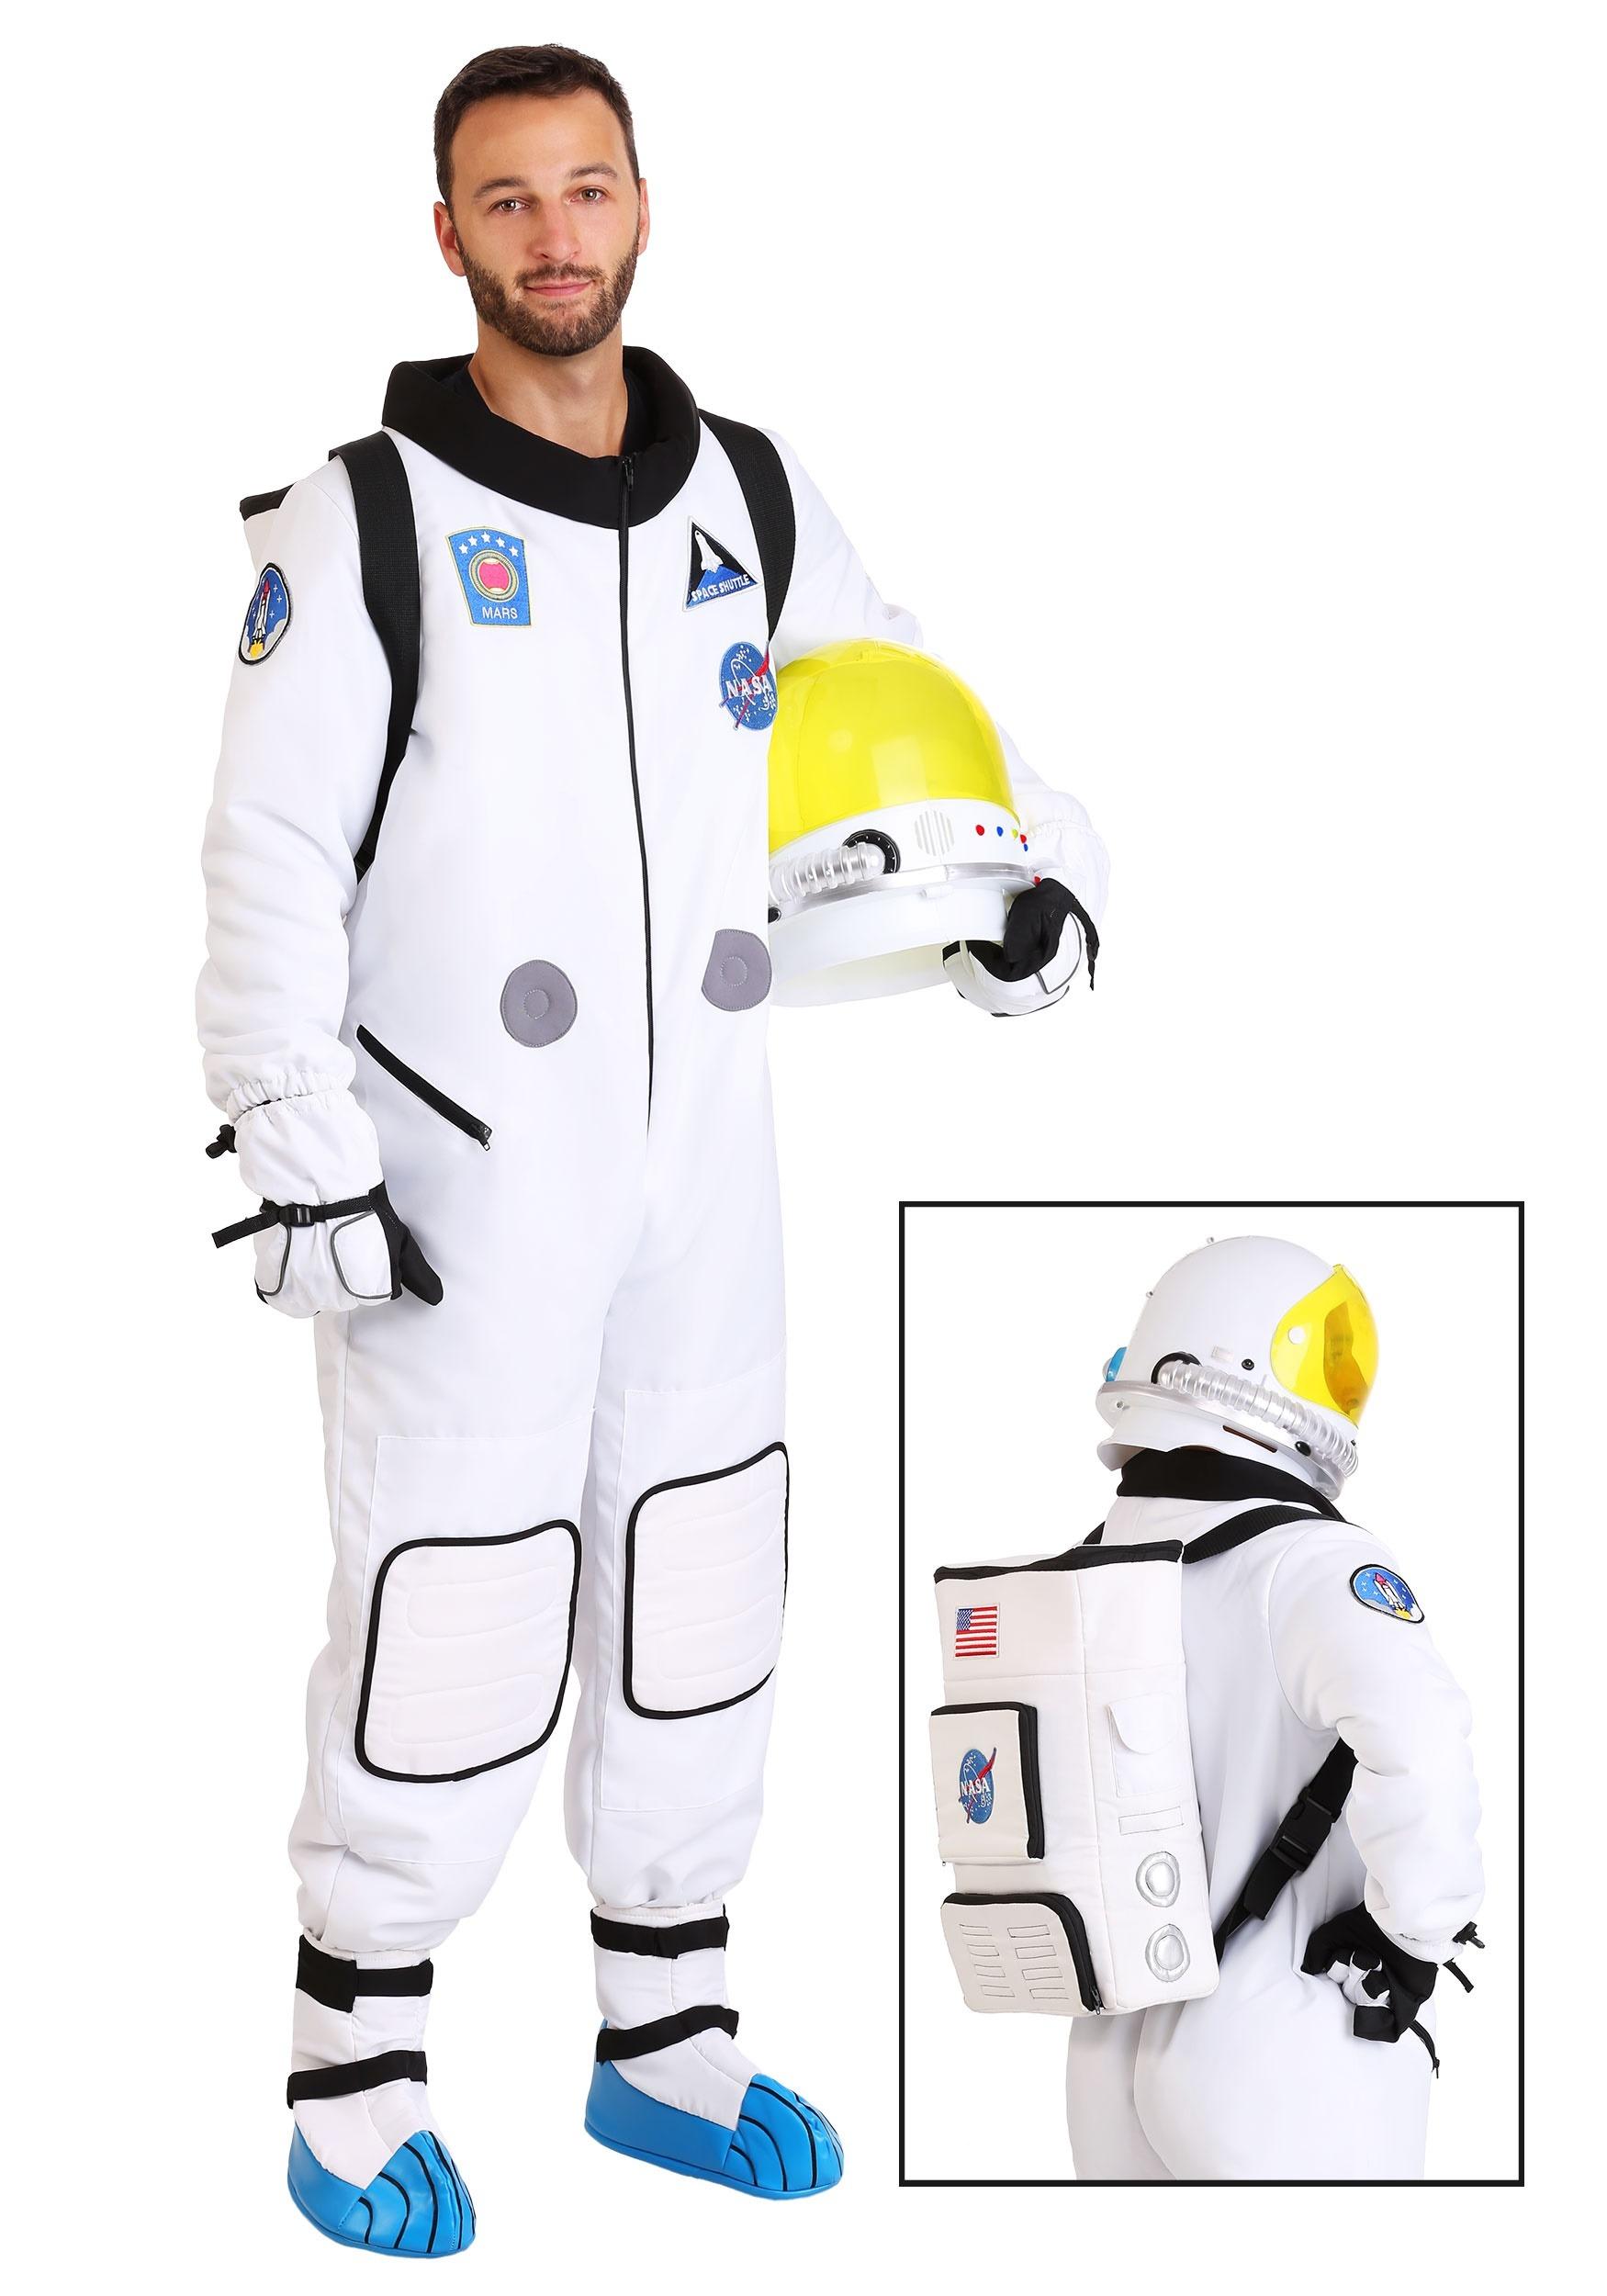 c3b43243d438 Mens Deluxe Astronaut Costume Update Main